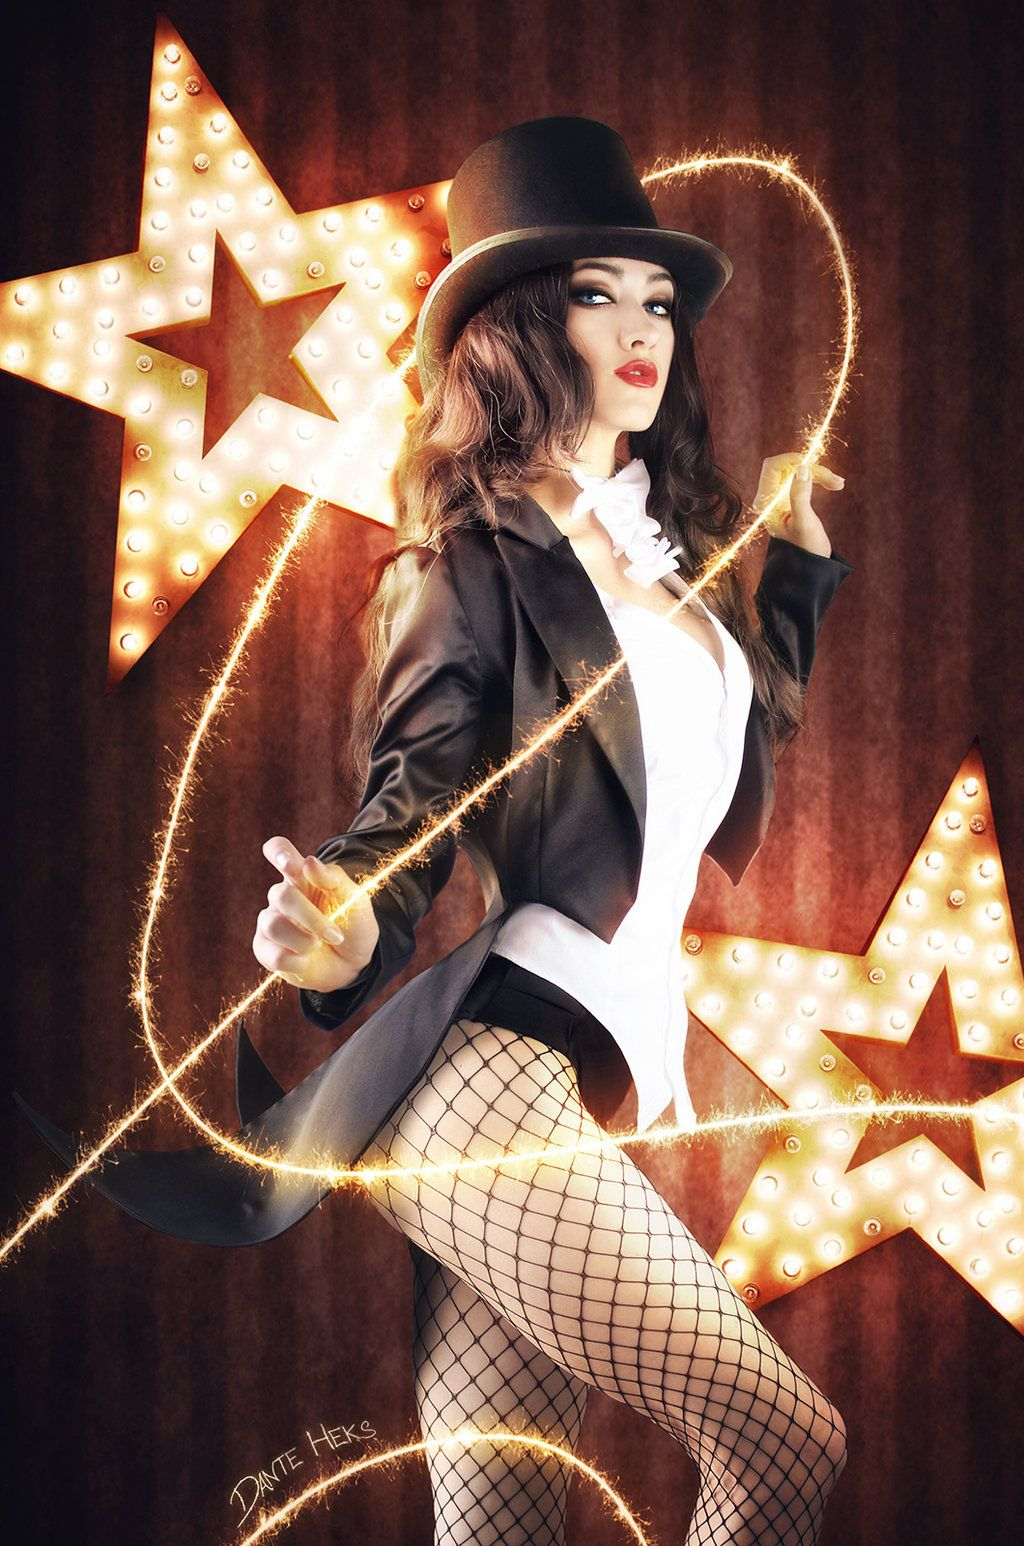 Zatanna Zatara from injustice DC comics cosplay for